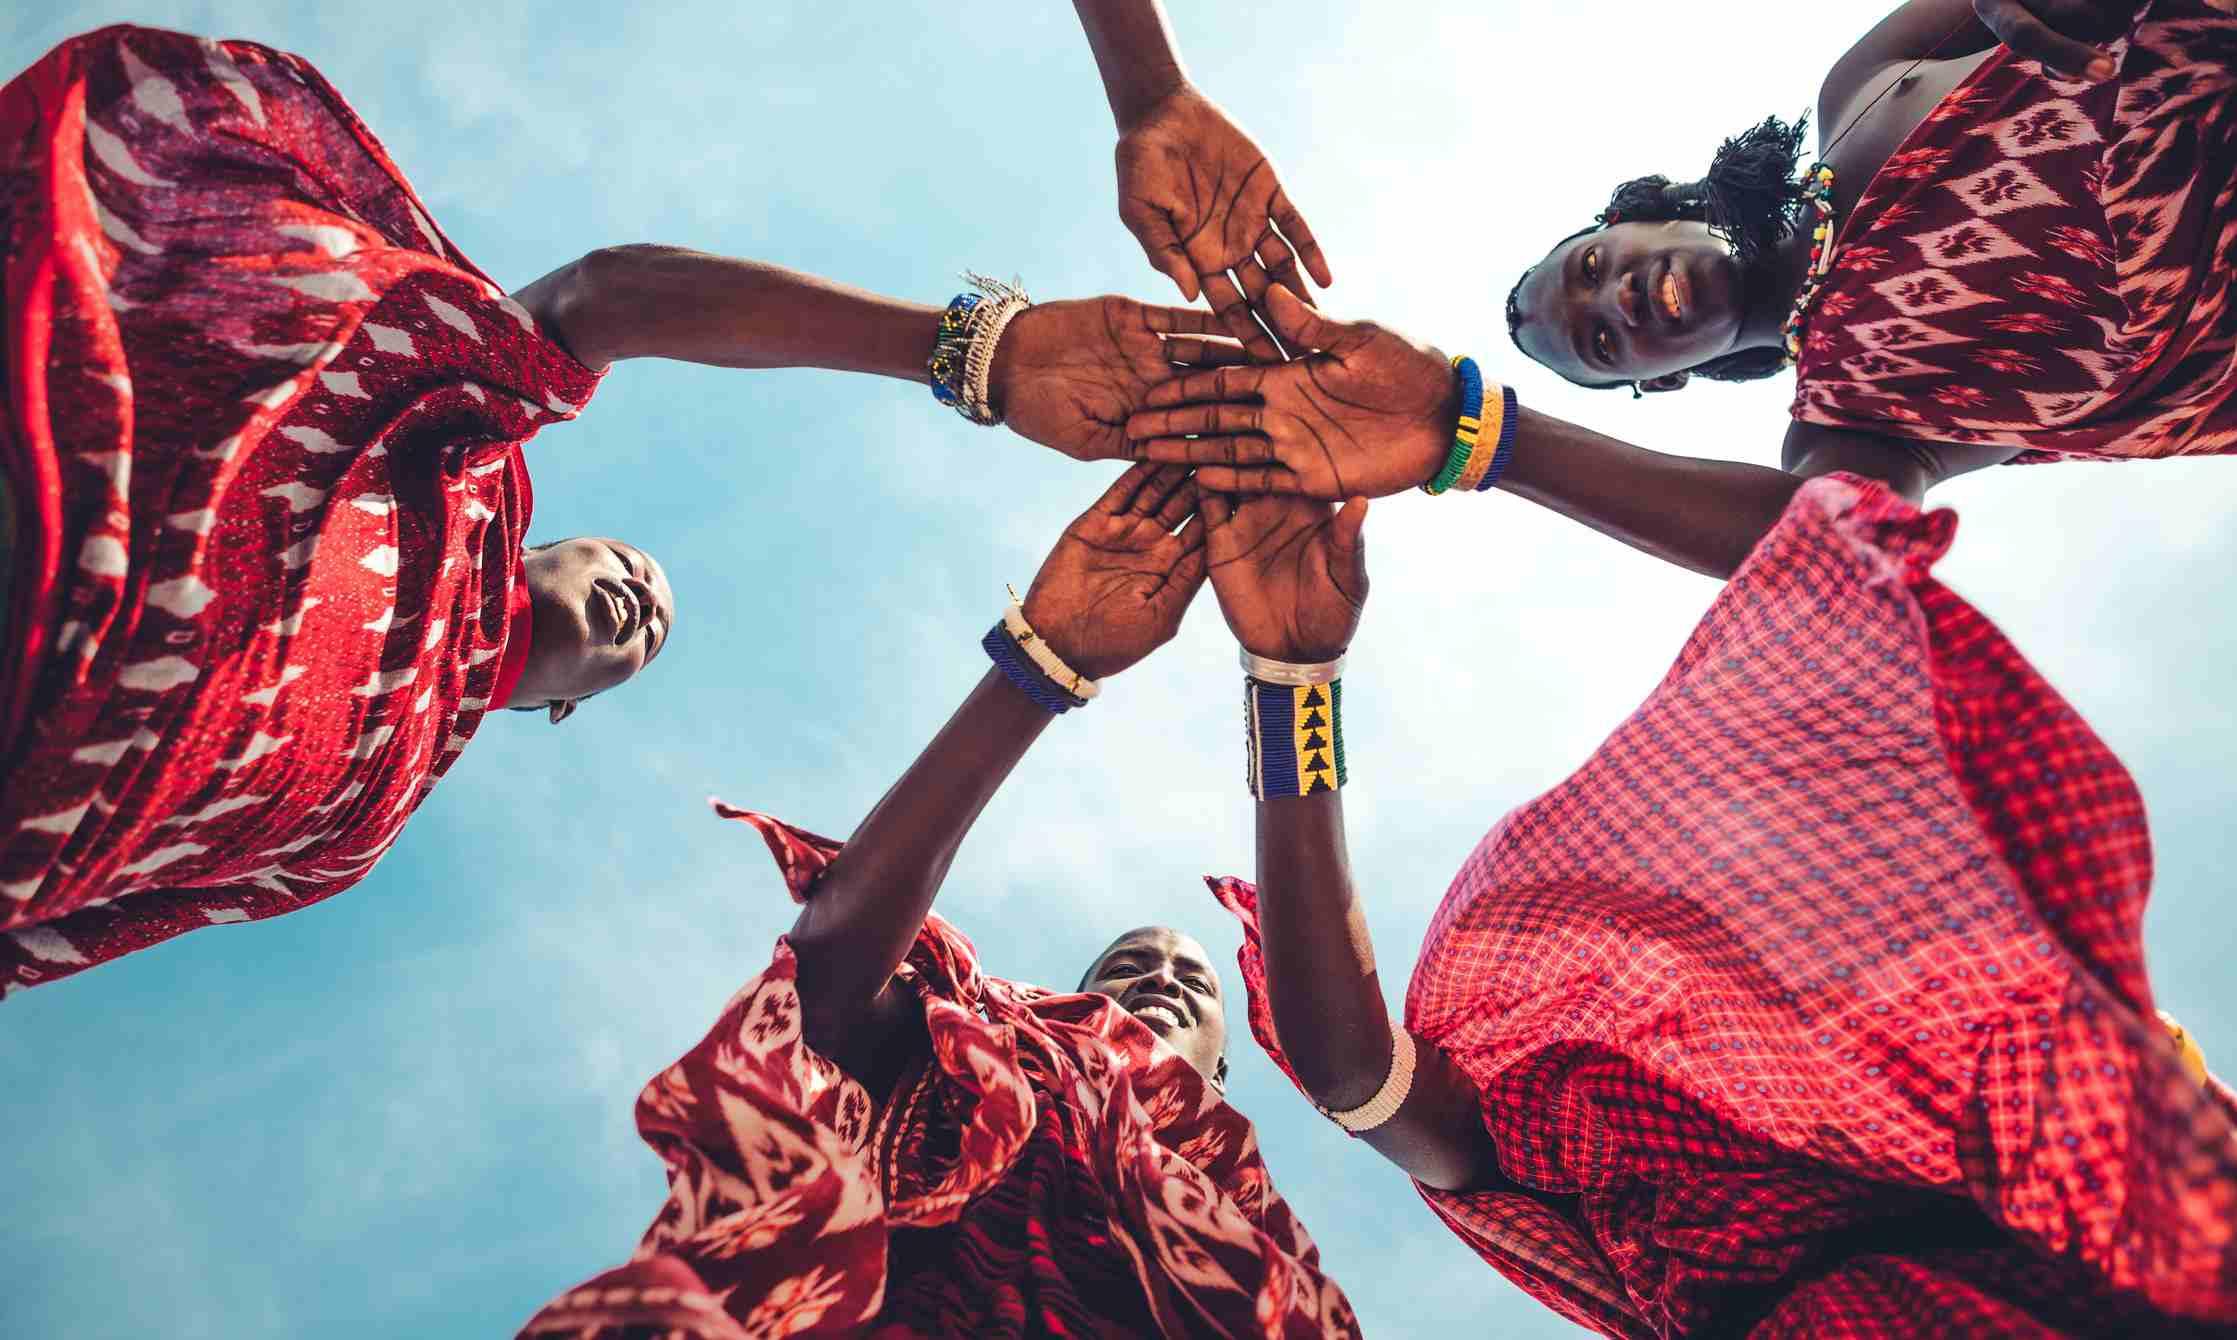 Masai in traditional clothes joining hands in unity (Zanzibar, Tanzania)